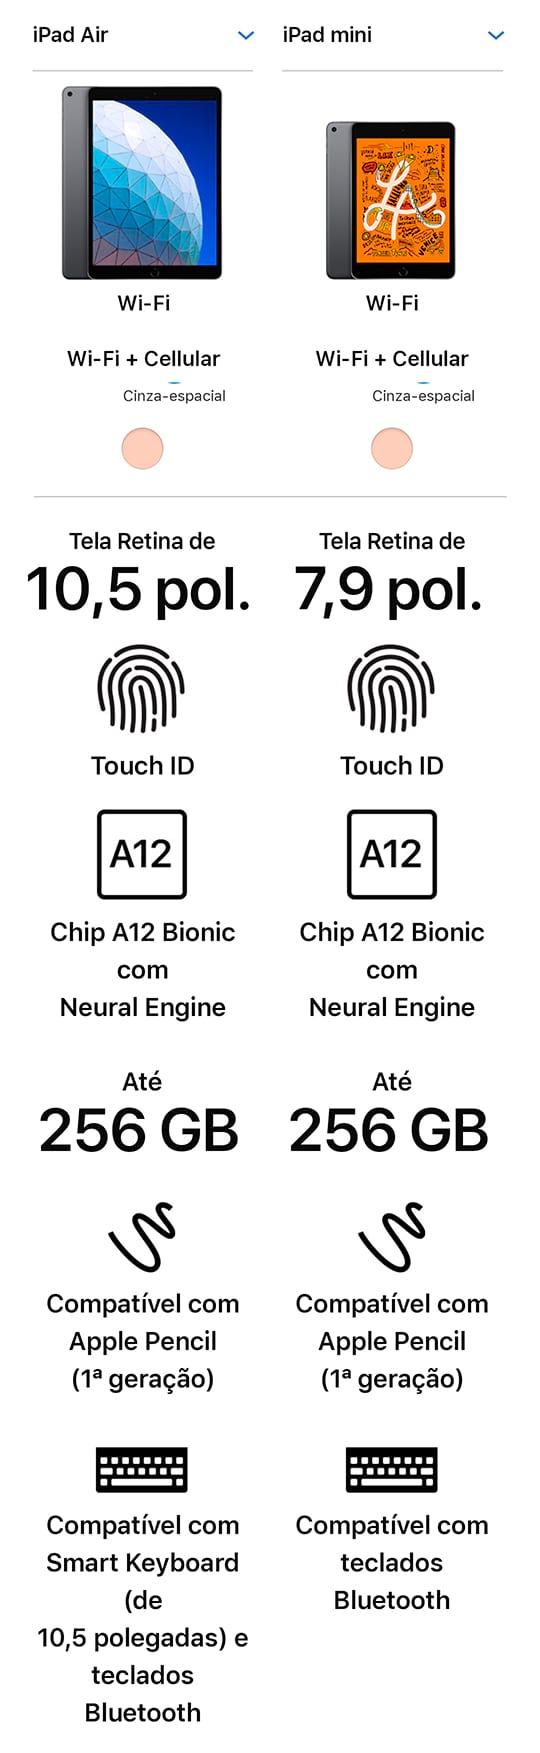 Apple iPad Air e Mini - Resumo de Especificações